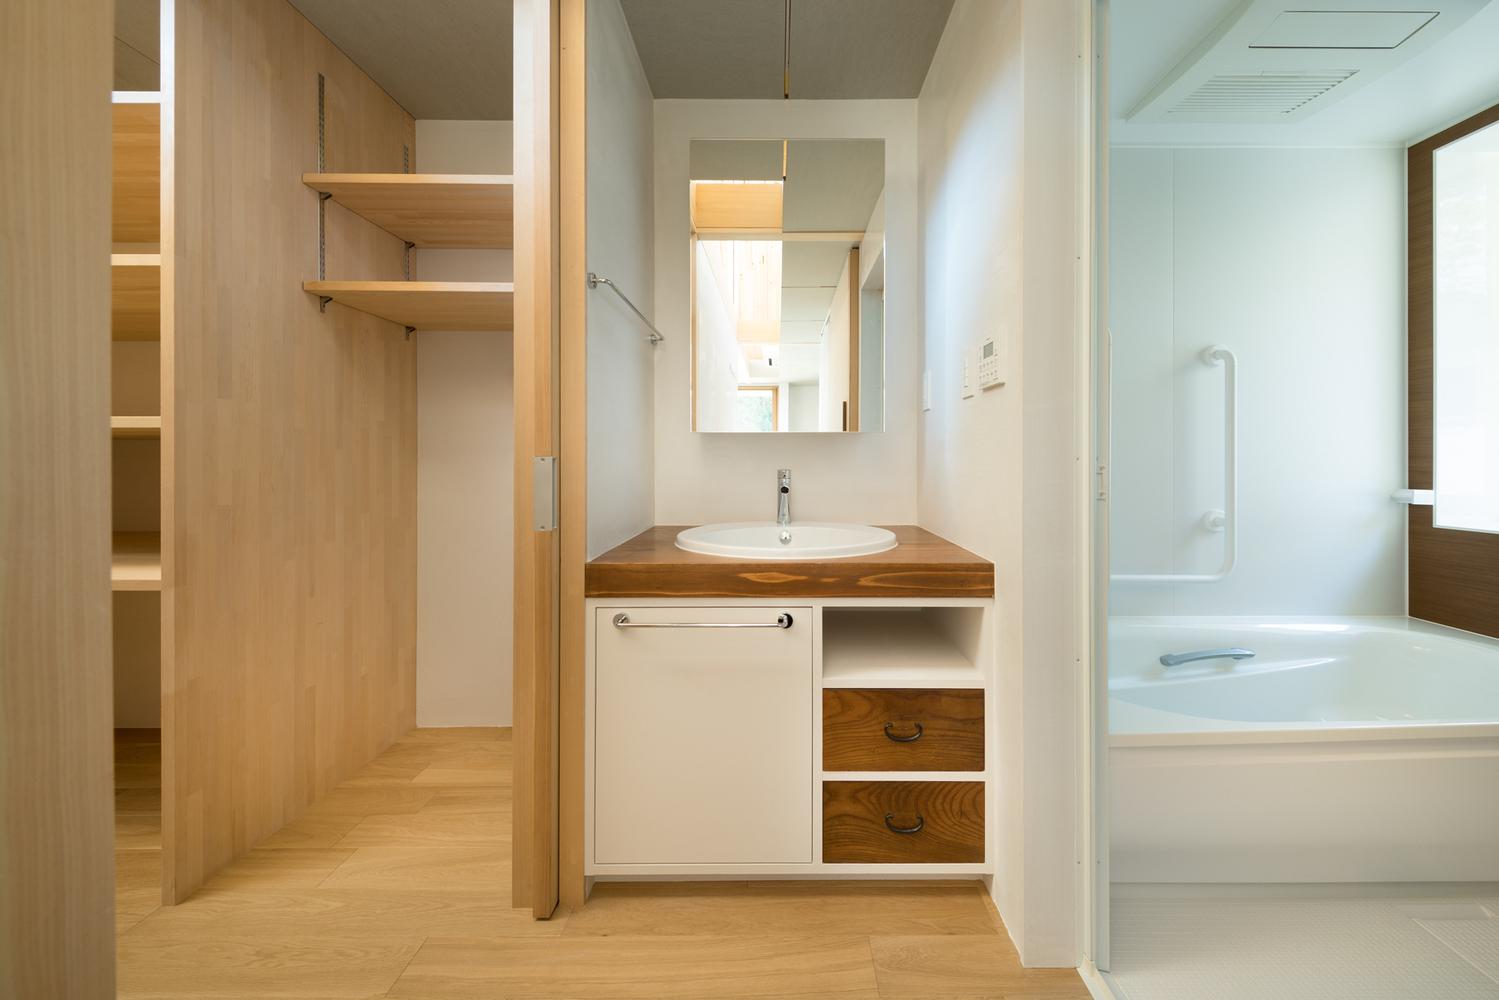 Gallery of Dutch Gable Roof House / Hiroki Tominaga-Atelier - 15